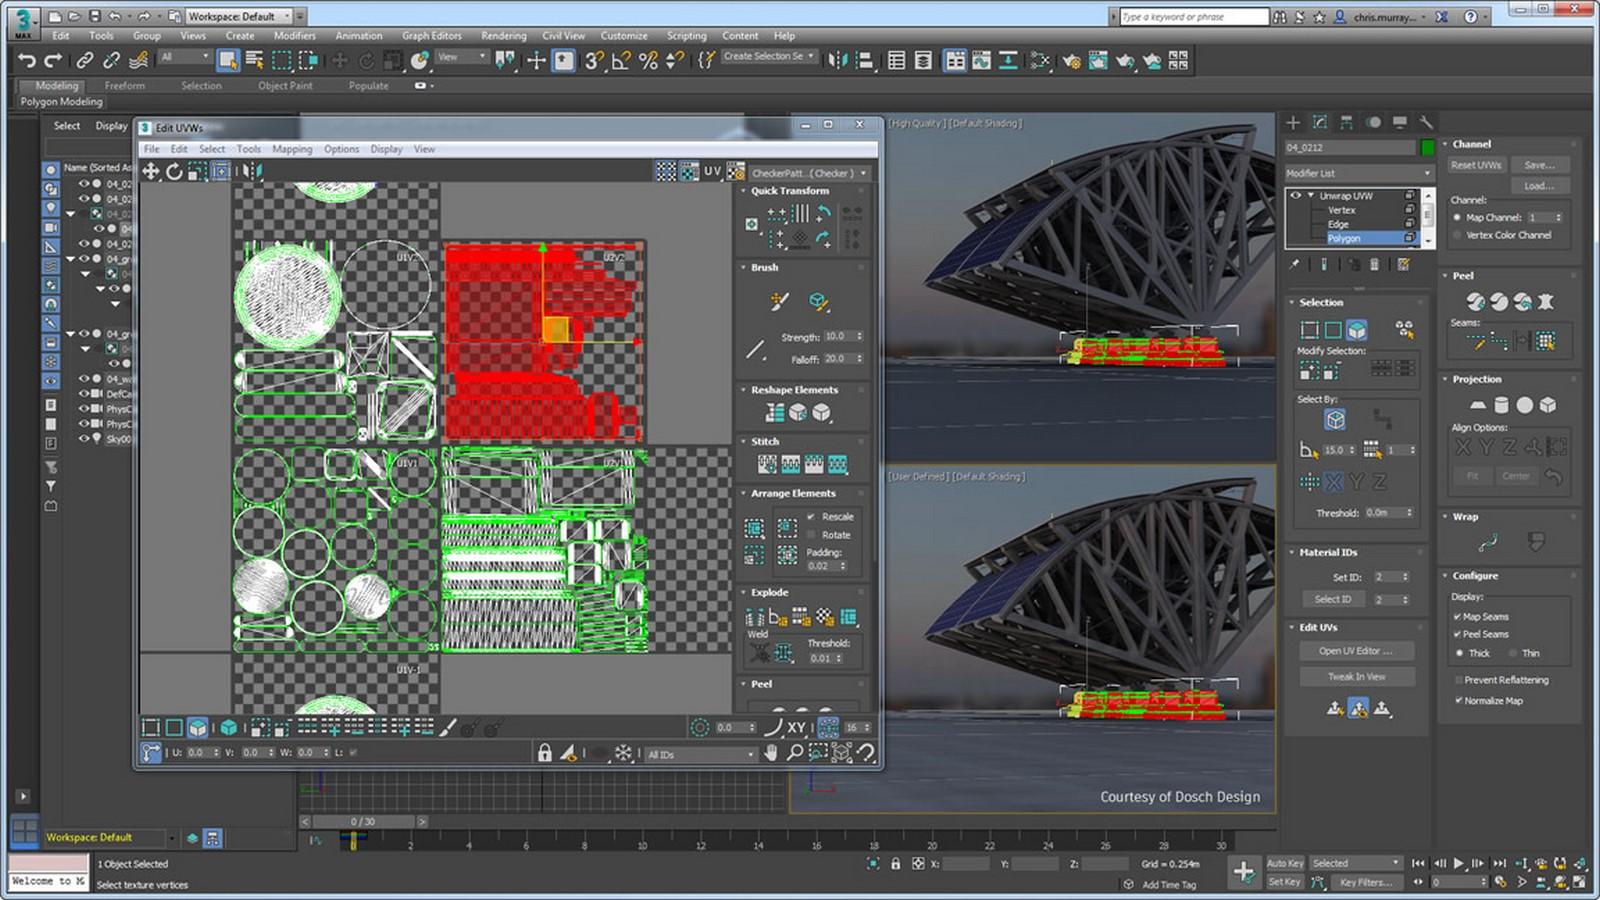 Autodesk 3ds Max - Sheet4